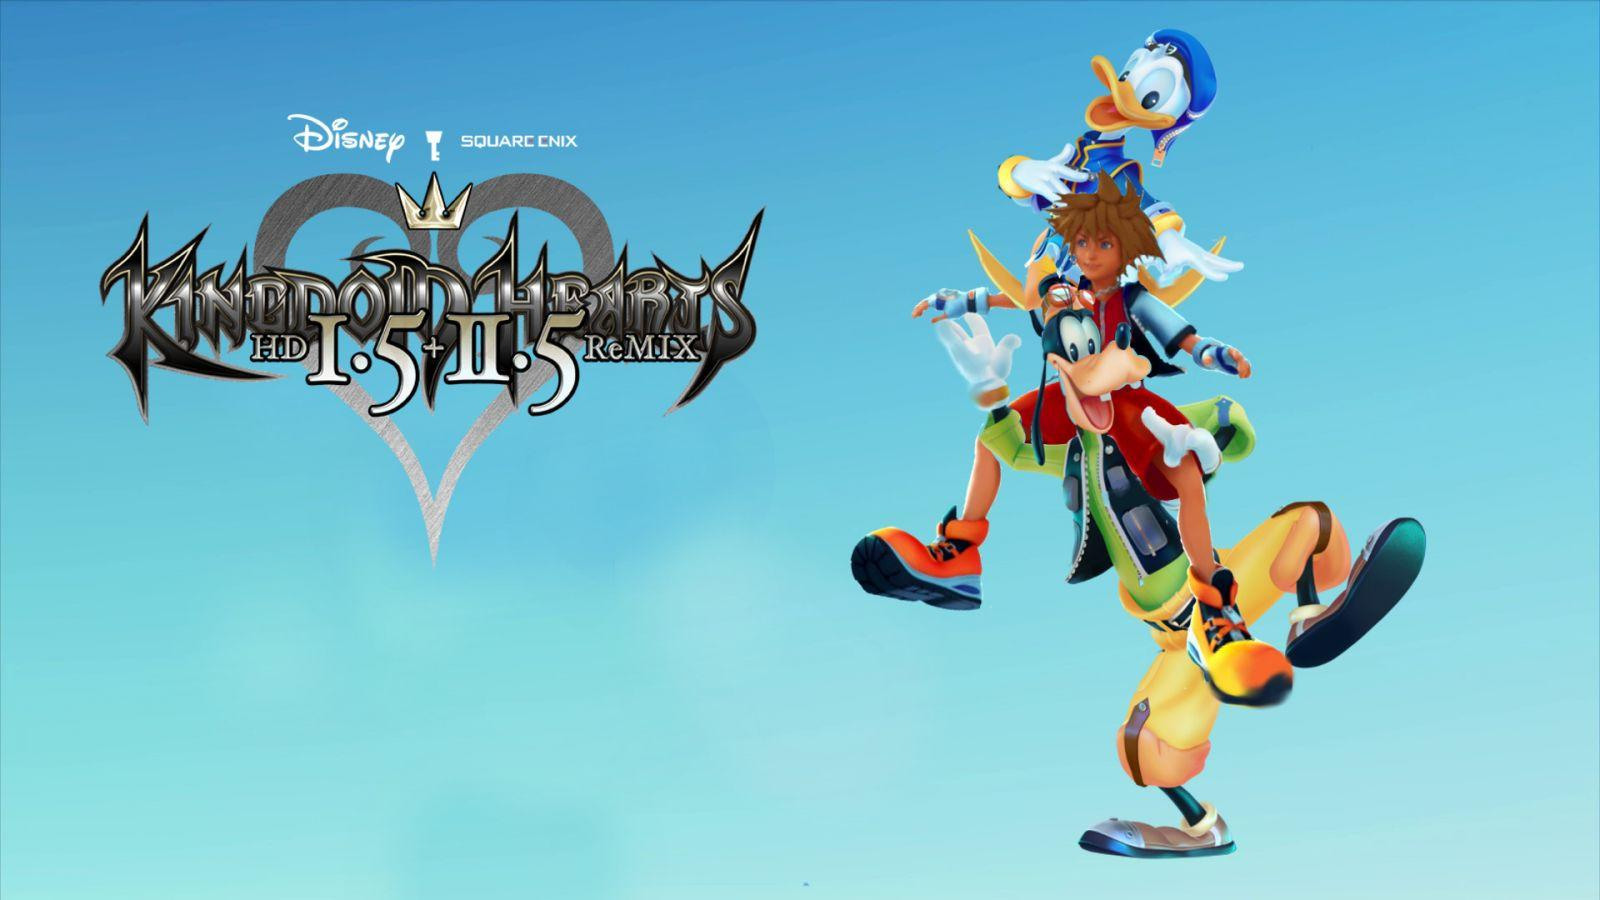 Kingdom Hearts 1.5+2.5 CG wallpaper